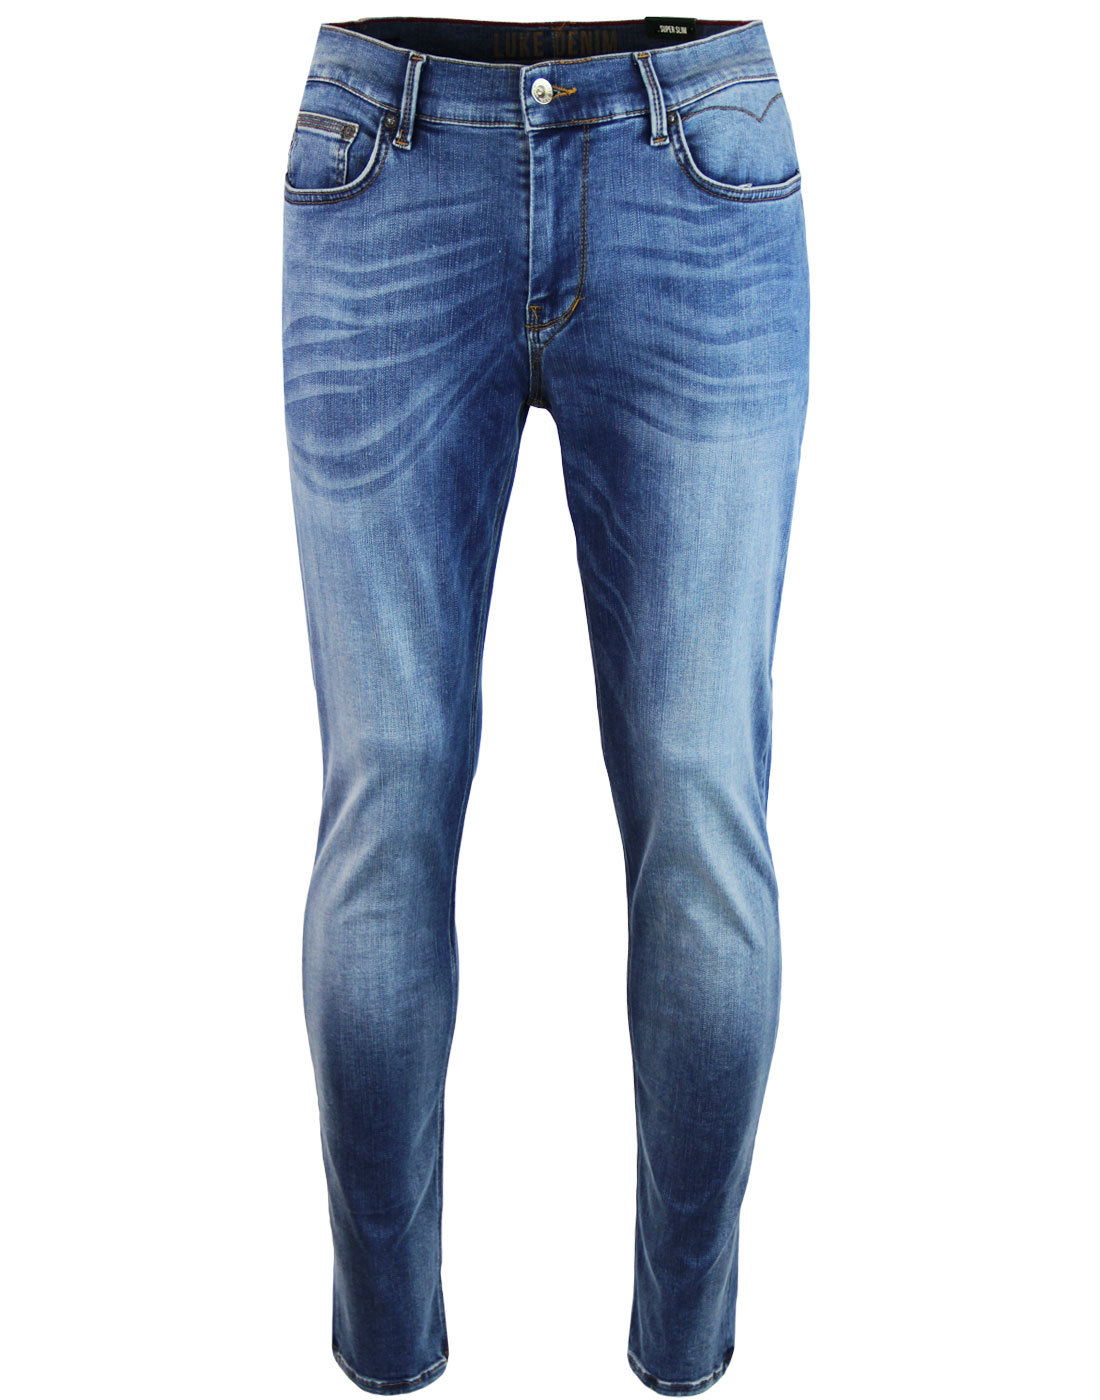 Rui LUKE 1977 Retro Skinny Fit Jeans LIGHT BLUE